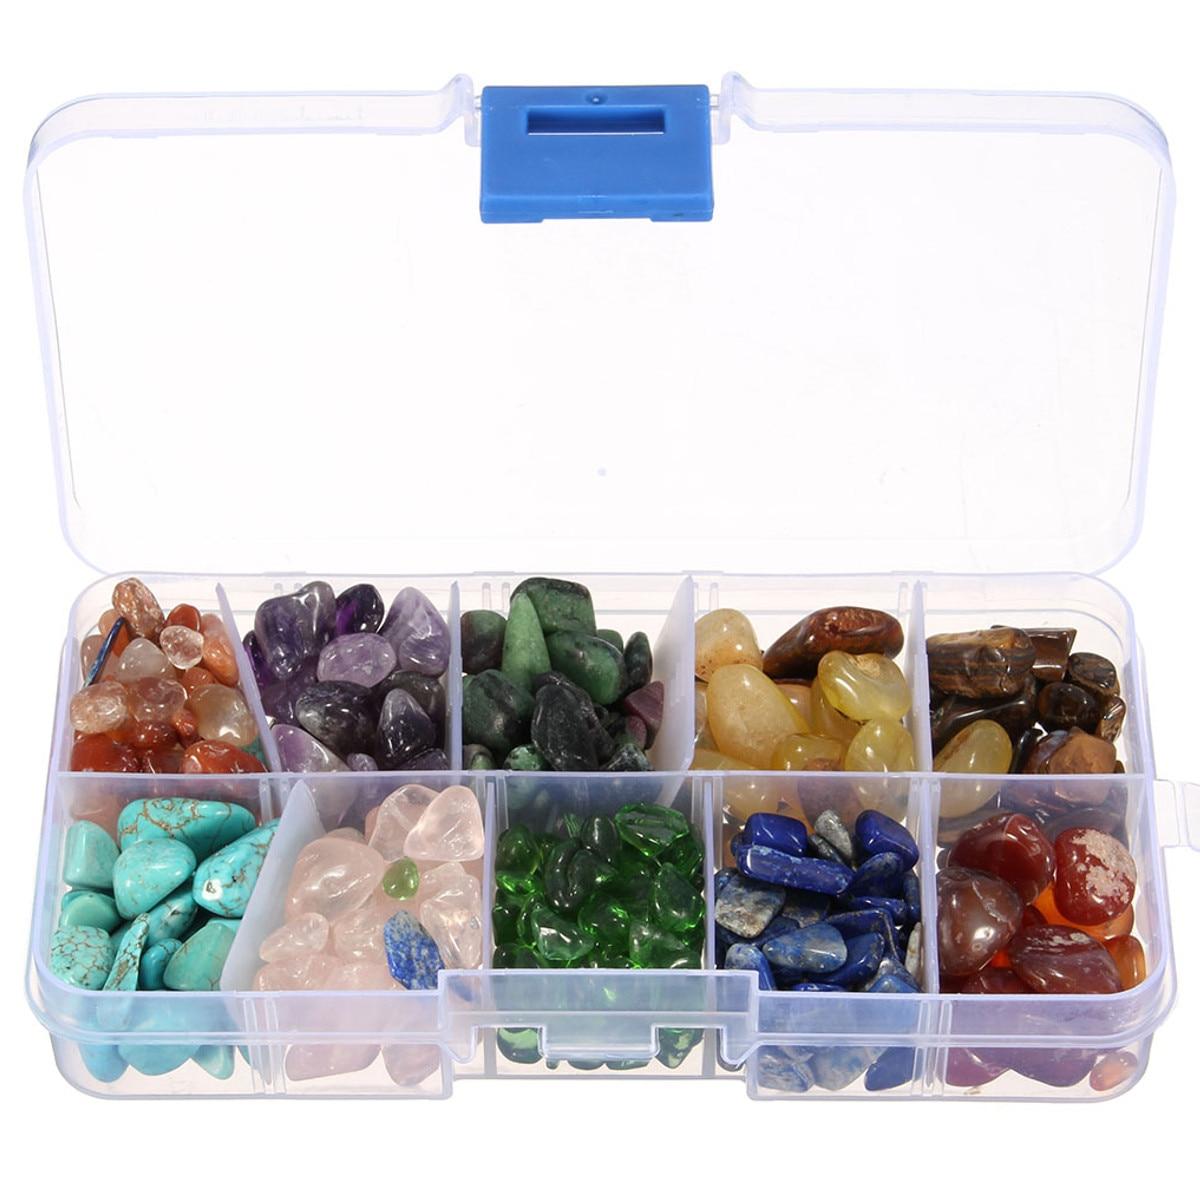 Set 10 Kinds Stone Chakras Crystal Healing Tumbled Natural Quartz Crystal Stones Minerals Irregular Shape Decorative With Box